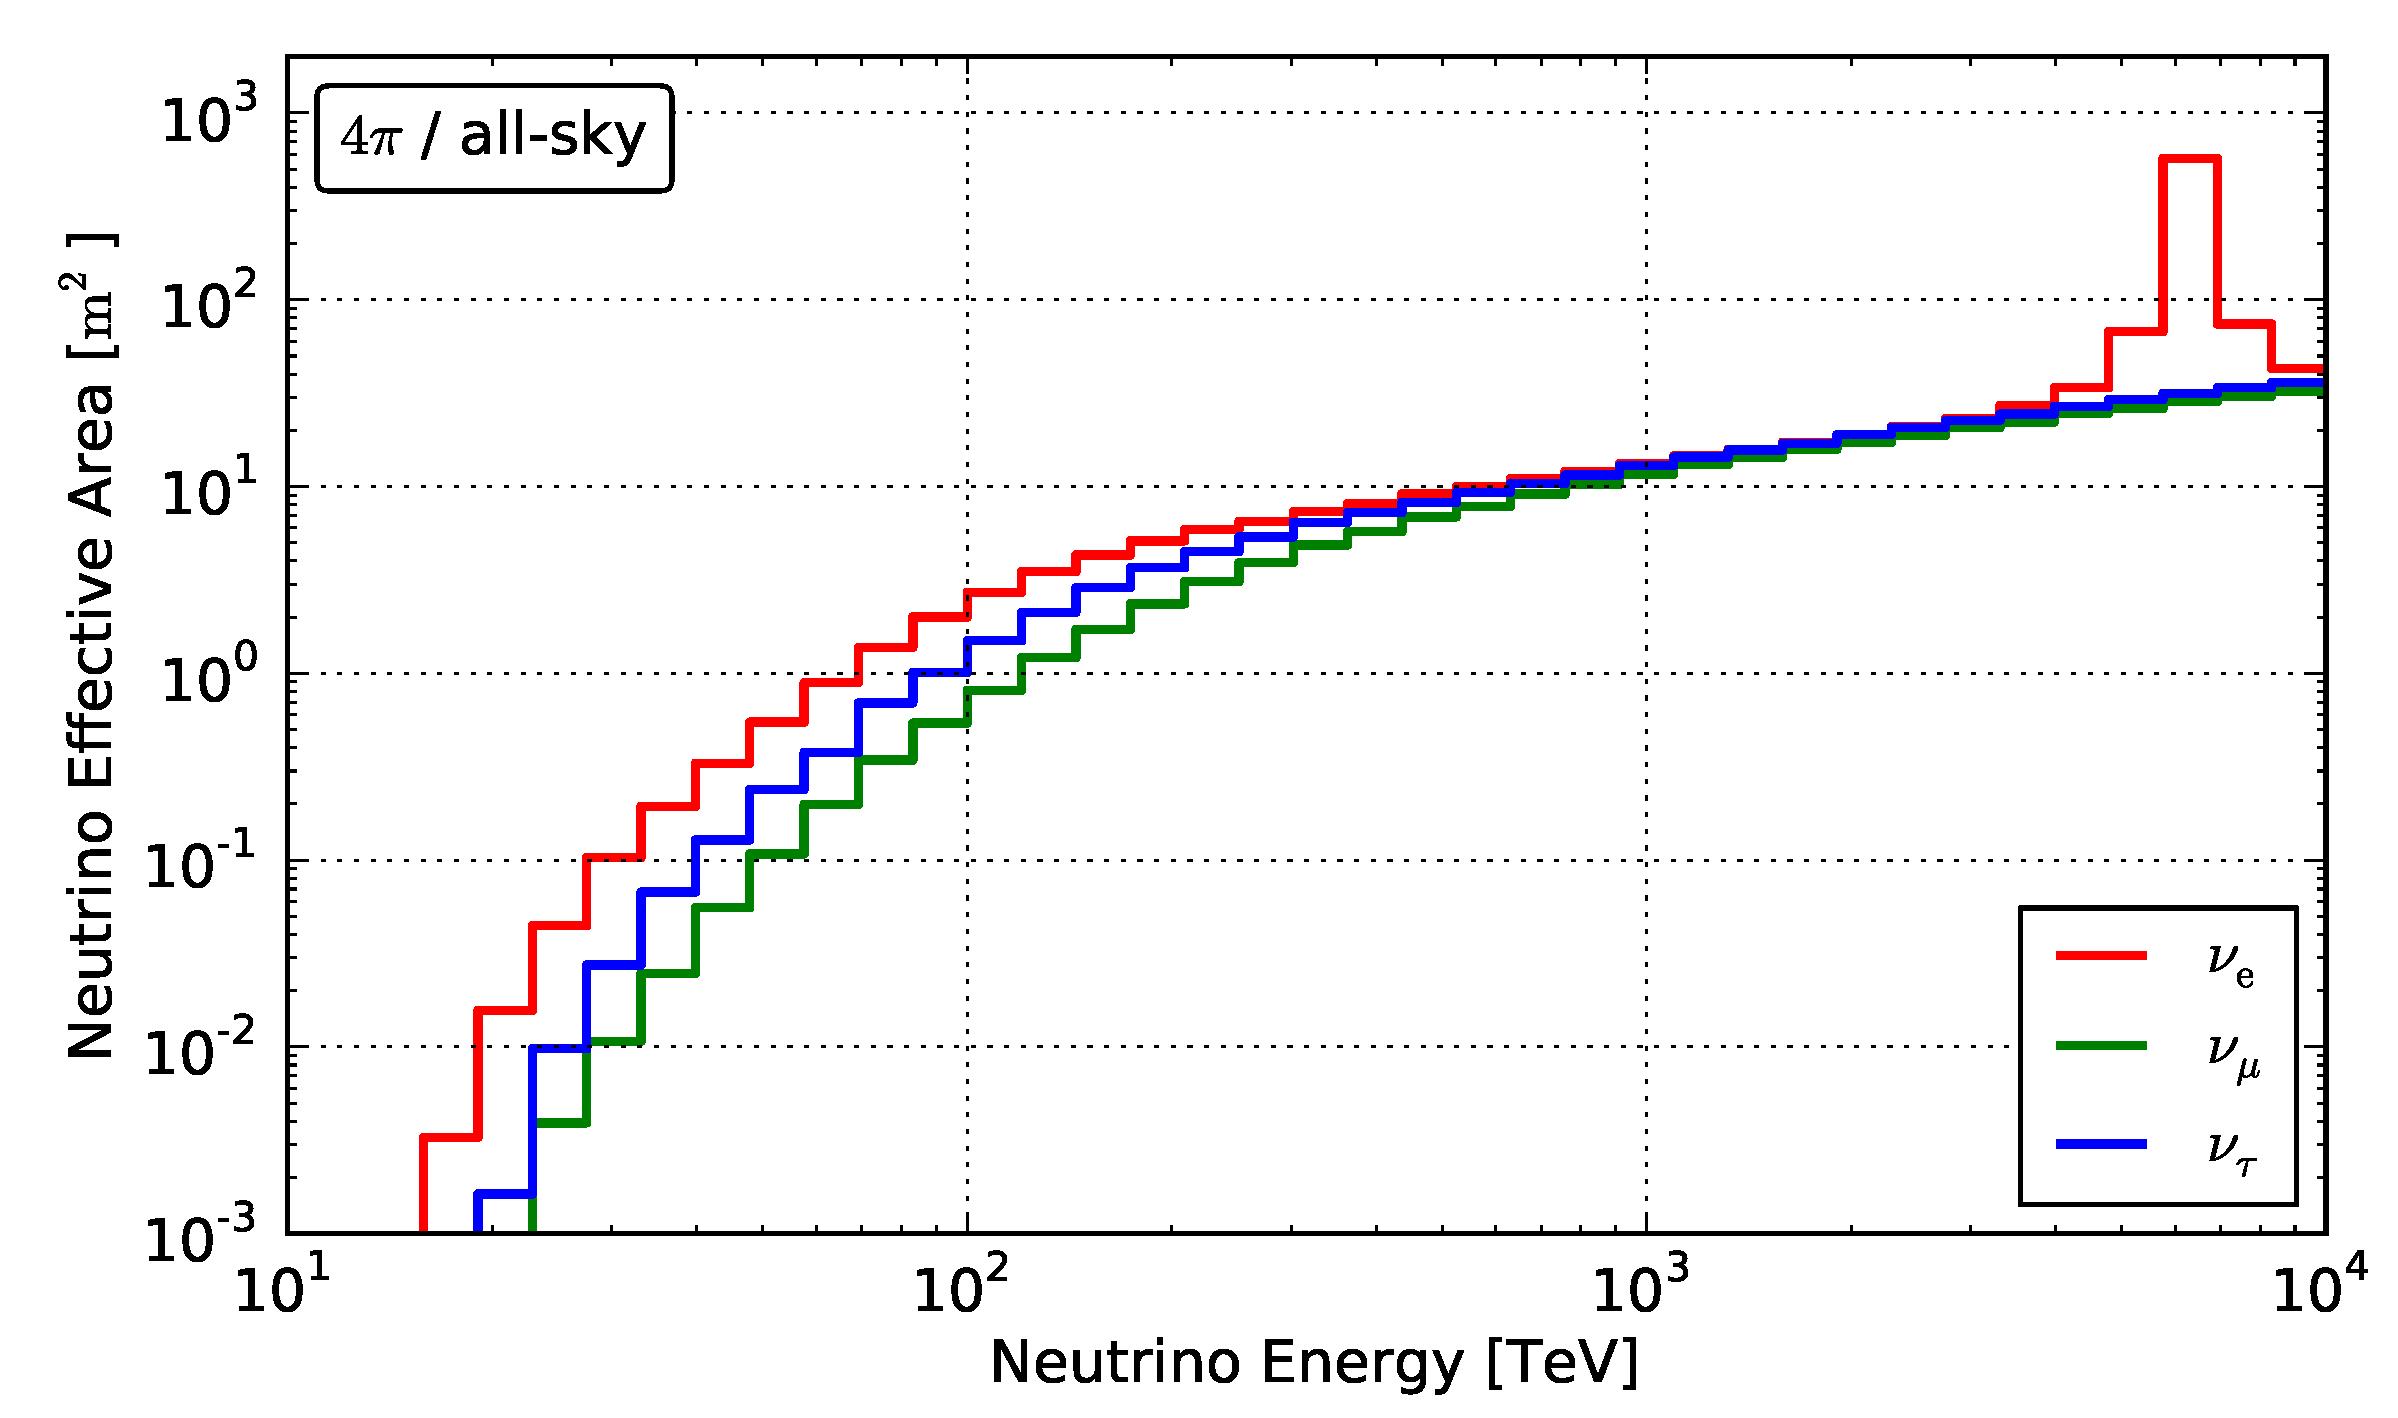 Neutrino effective area for the high-energy neutrino search in IceCube